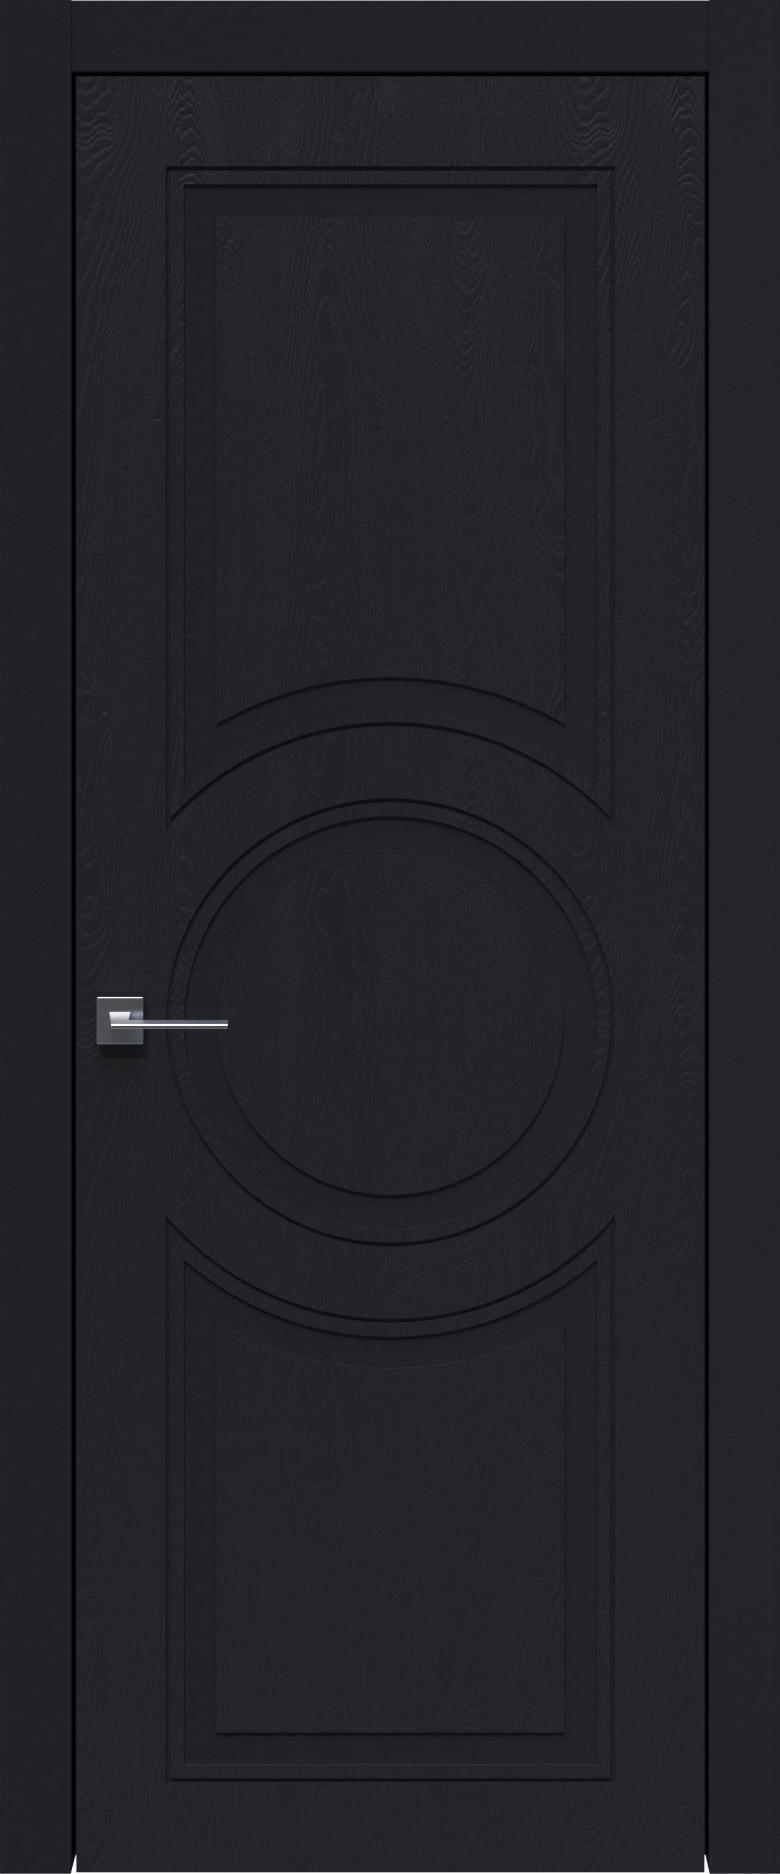 Ravenna Neo Classic цвет - Черная эмаль по шпону (RAL 9004) Без стекла (ДГ)